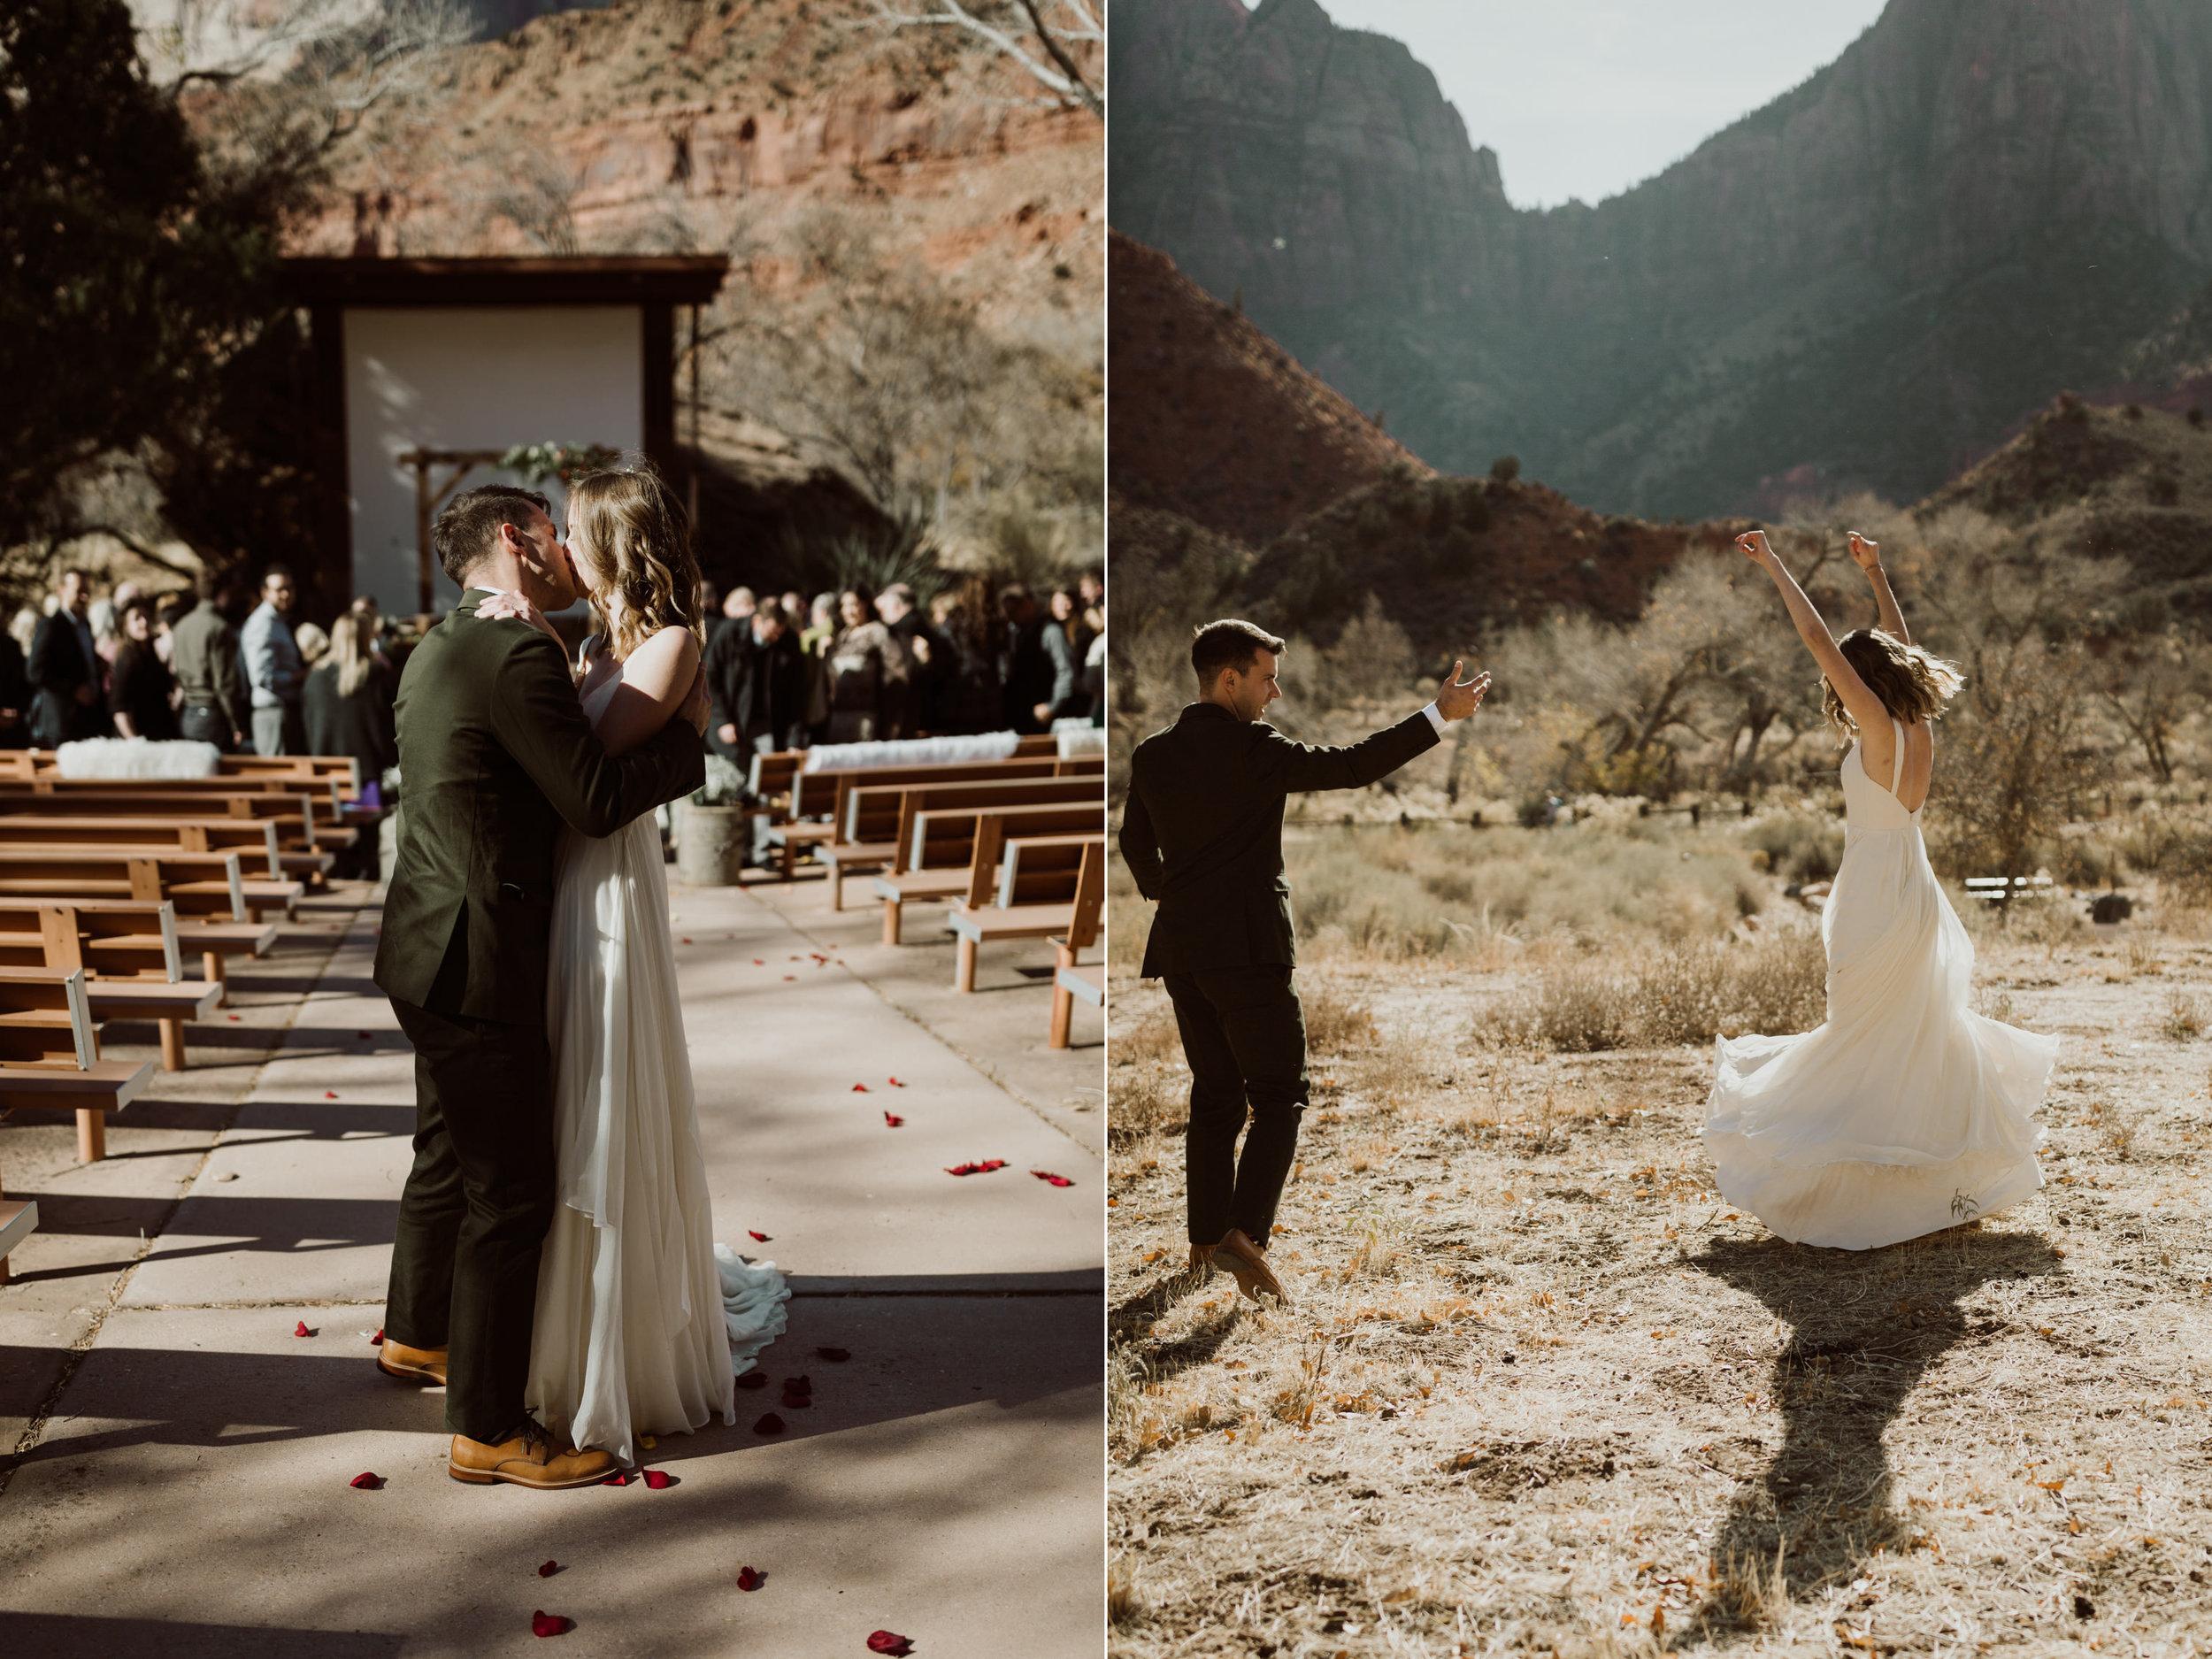 zion-national-park-wedding-163.jpg